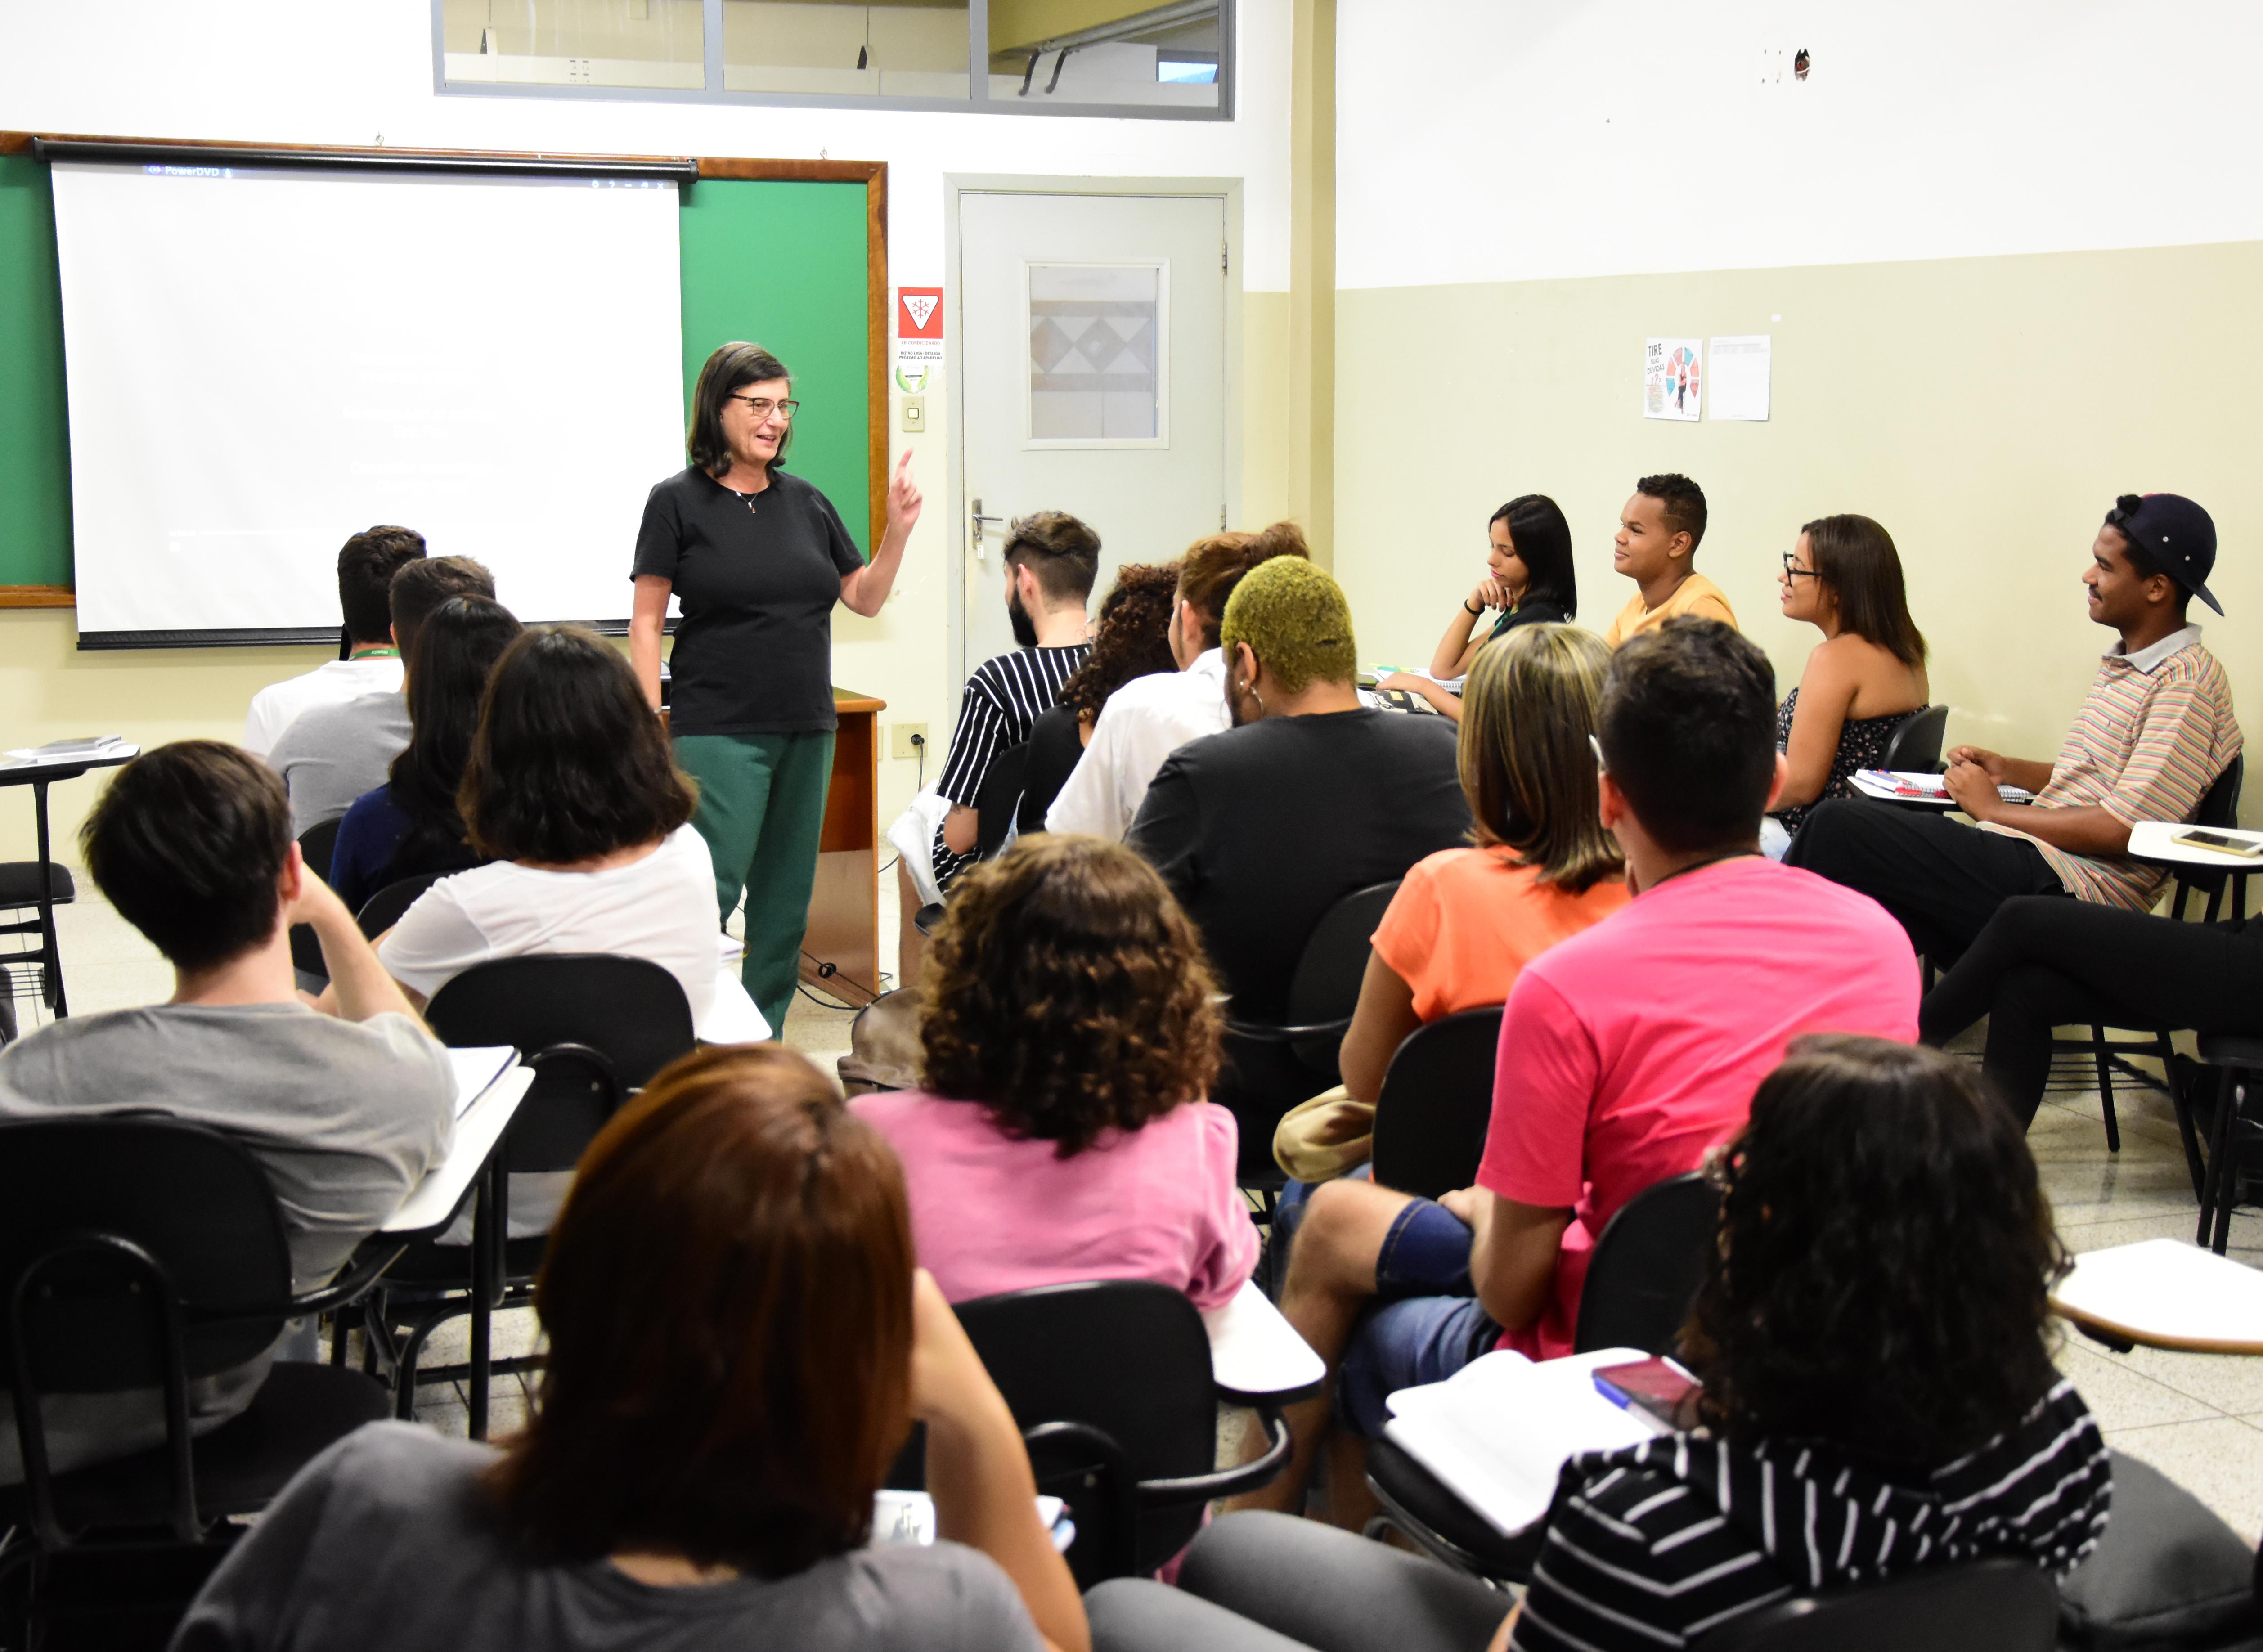 Simonetta Persichetti ministra aula sobre Estética em Fotografia na Facopp